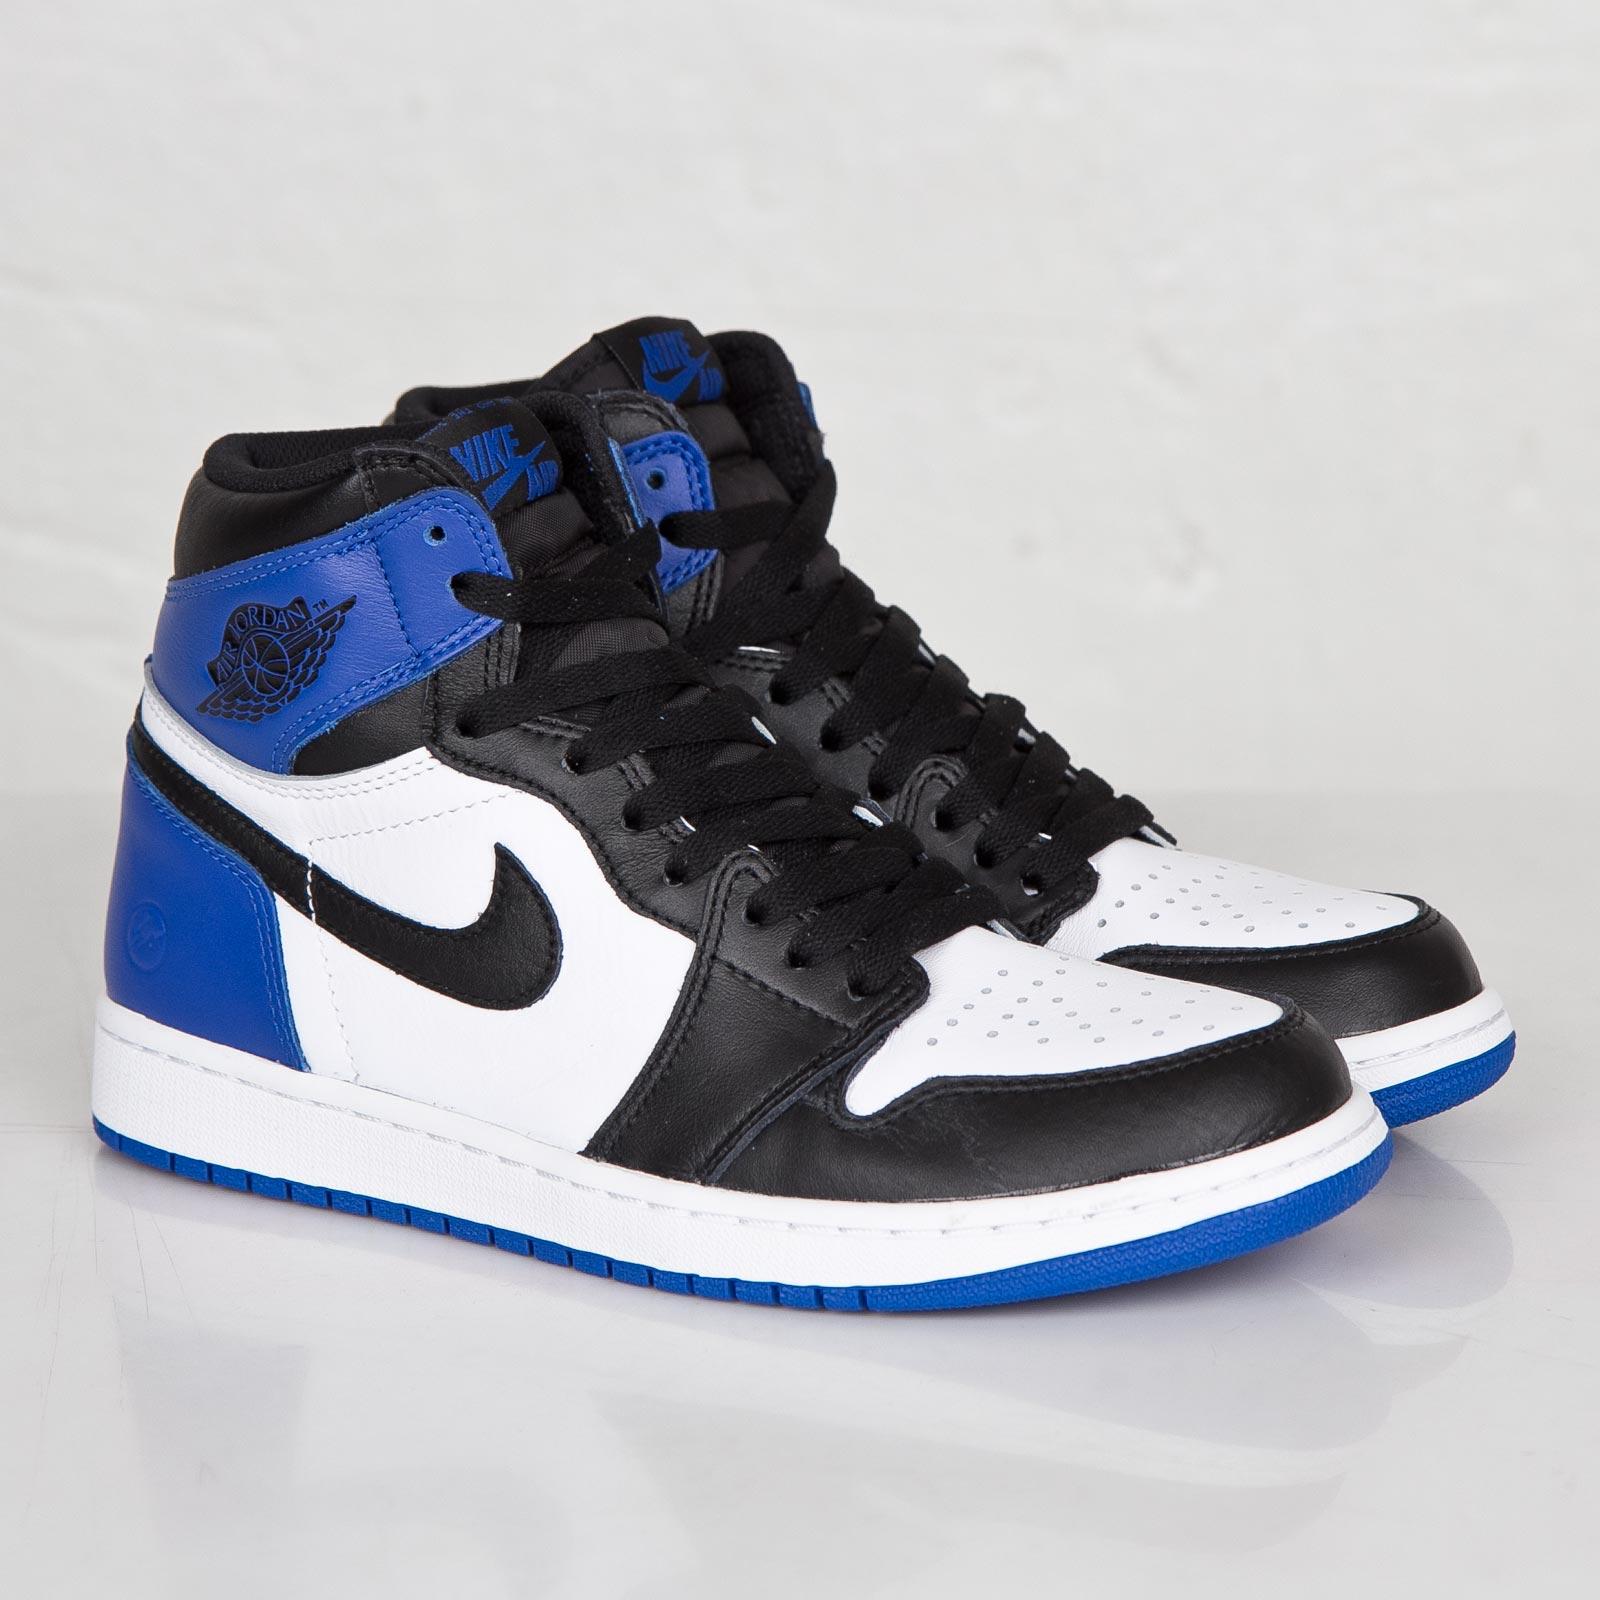 19851cfe1a6535 Jordan Brand Air Jordan 1 X Fragment - 716371-040 - Sneakersnstuff ...